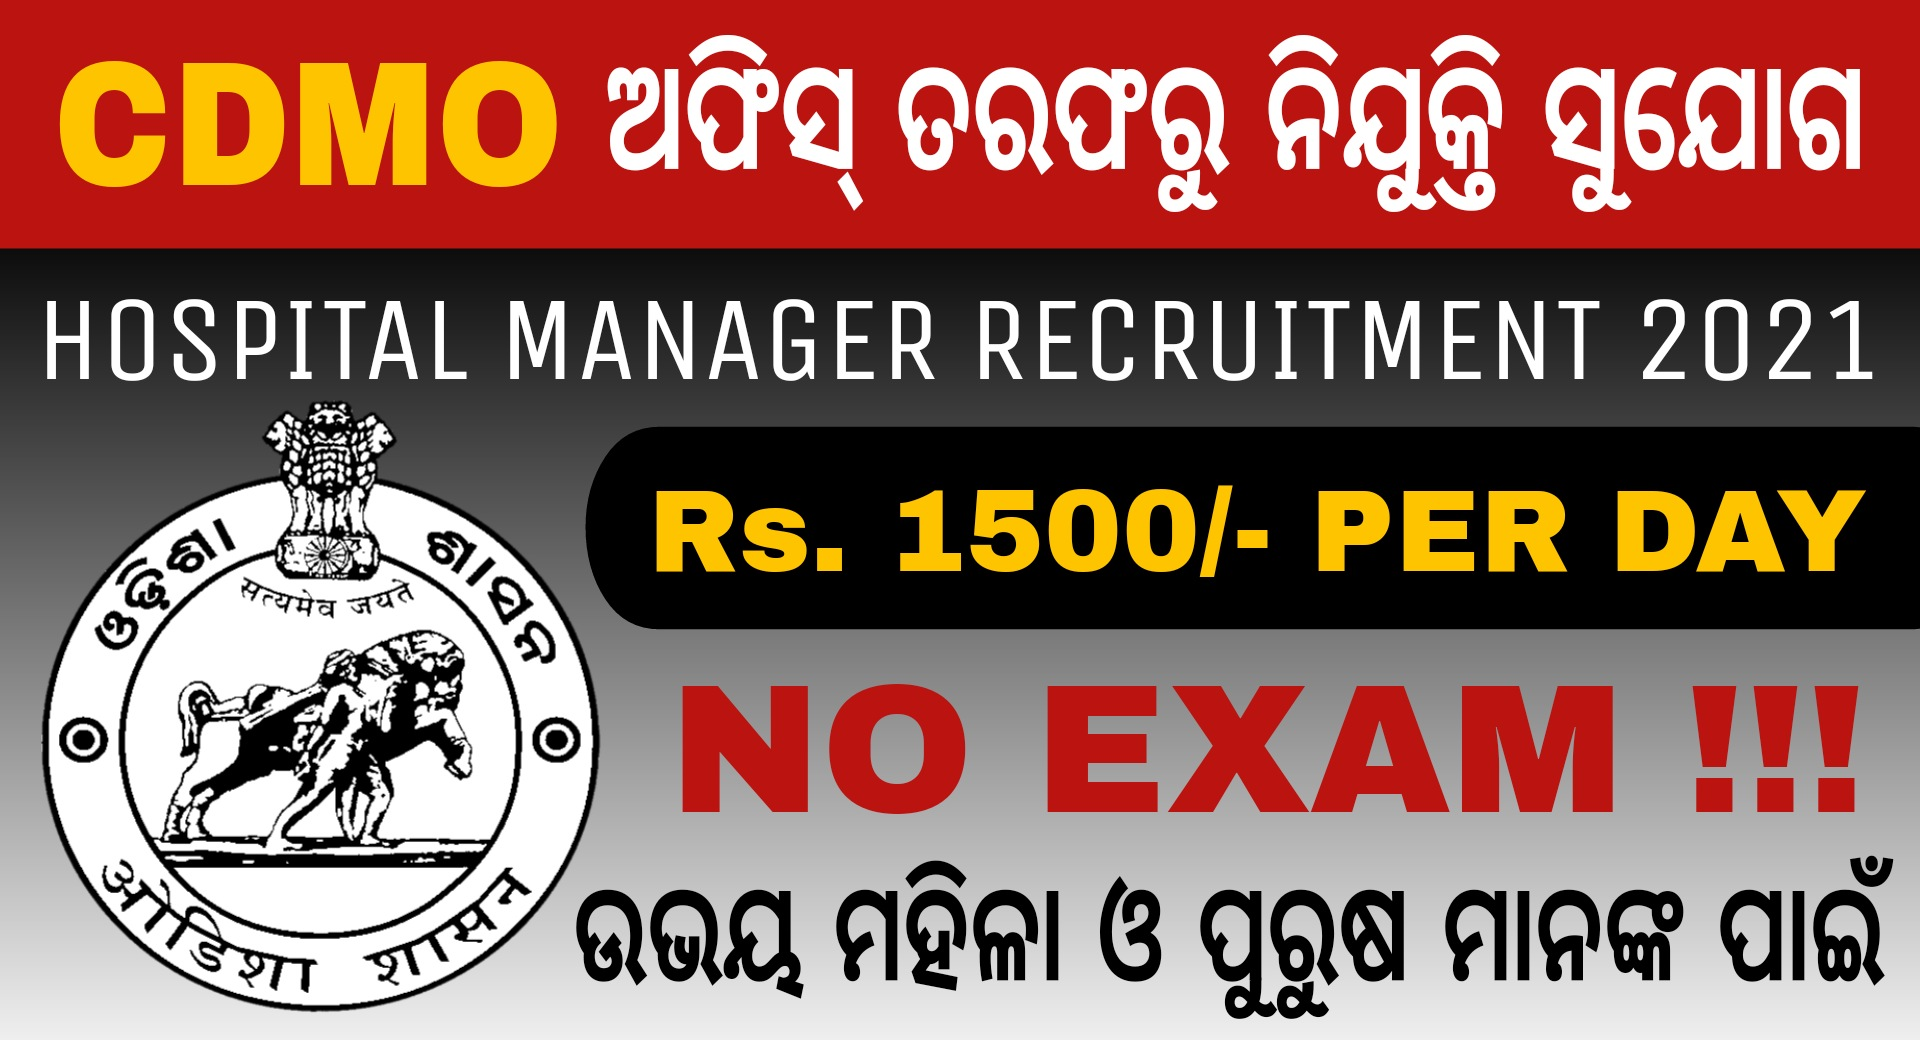 Kalahandi CDMO Office Recruitment 2021 – Jobs in Odisha